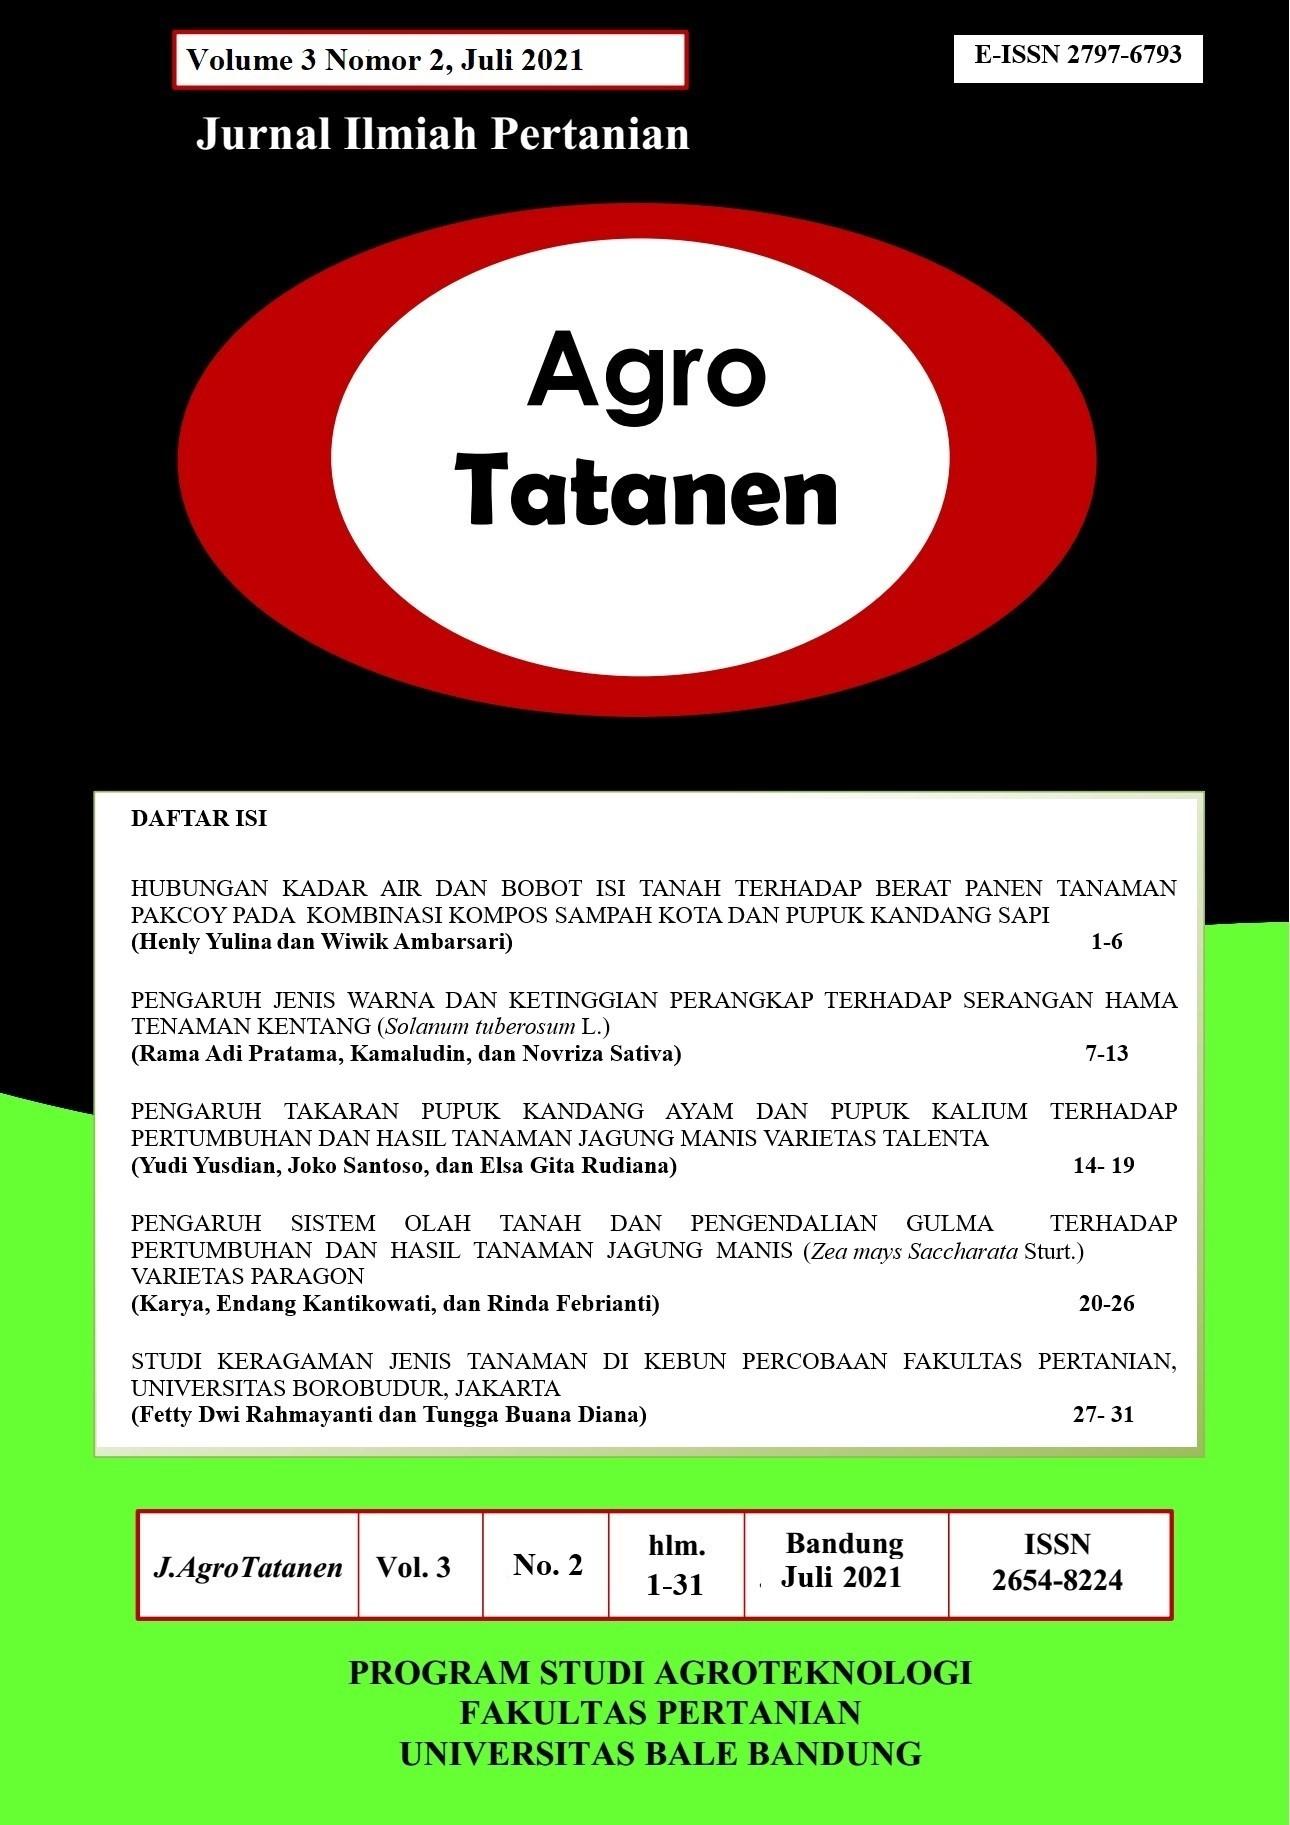 View Vol. 3 No. 2 (2021): AGRO TATANEN Edisi JULI 2021 | Jurnal Ilmiah Pertanian